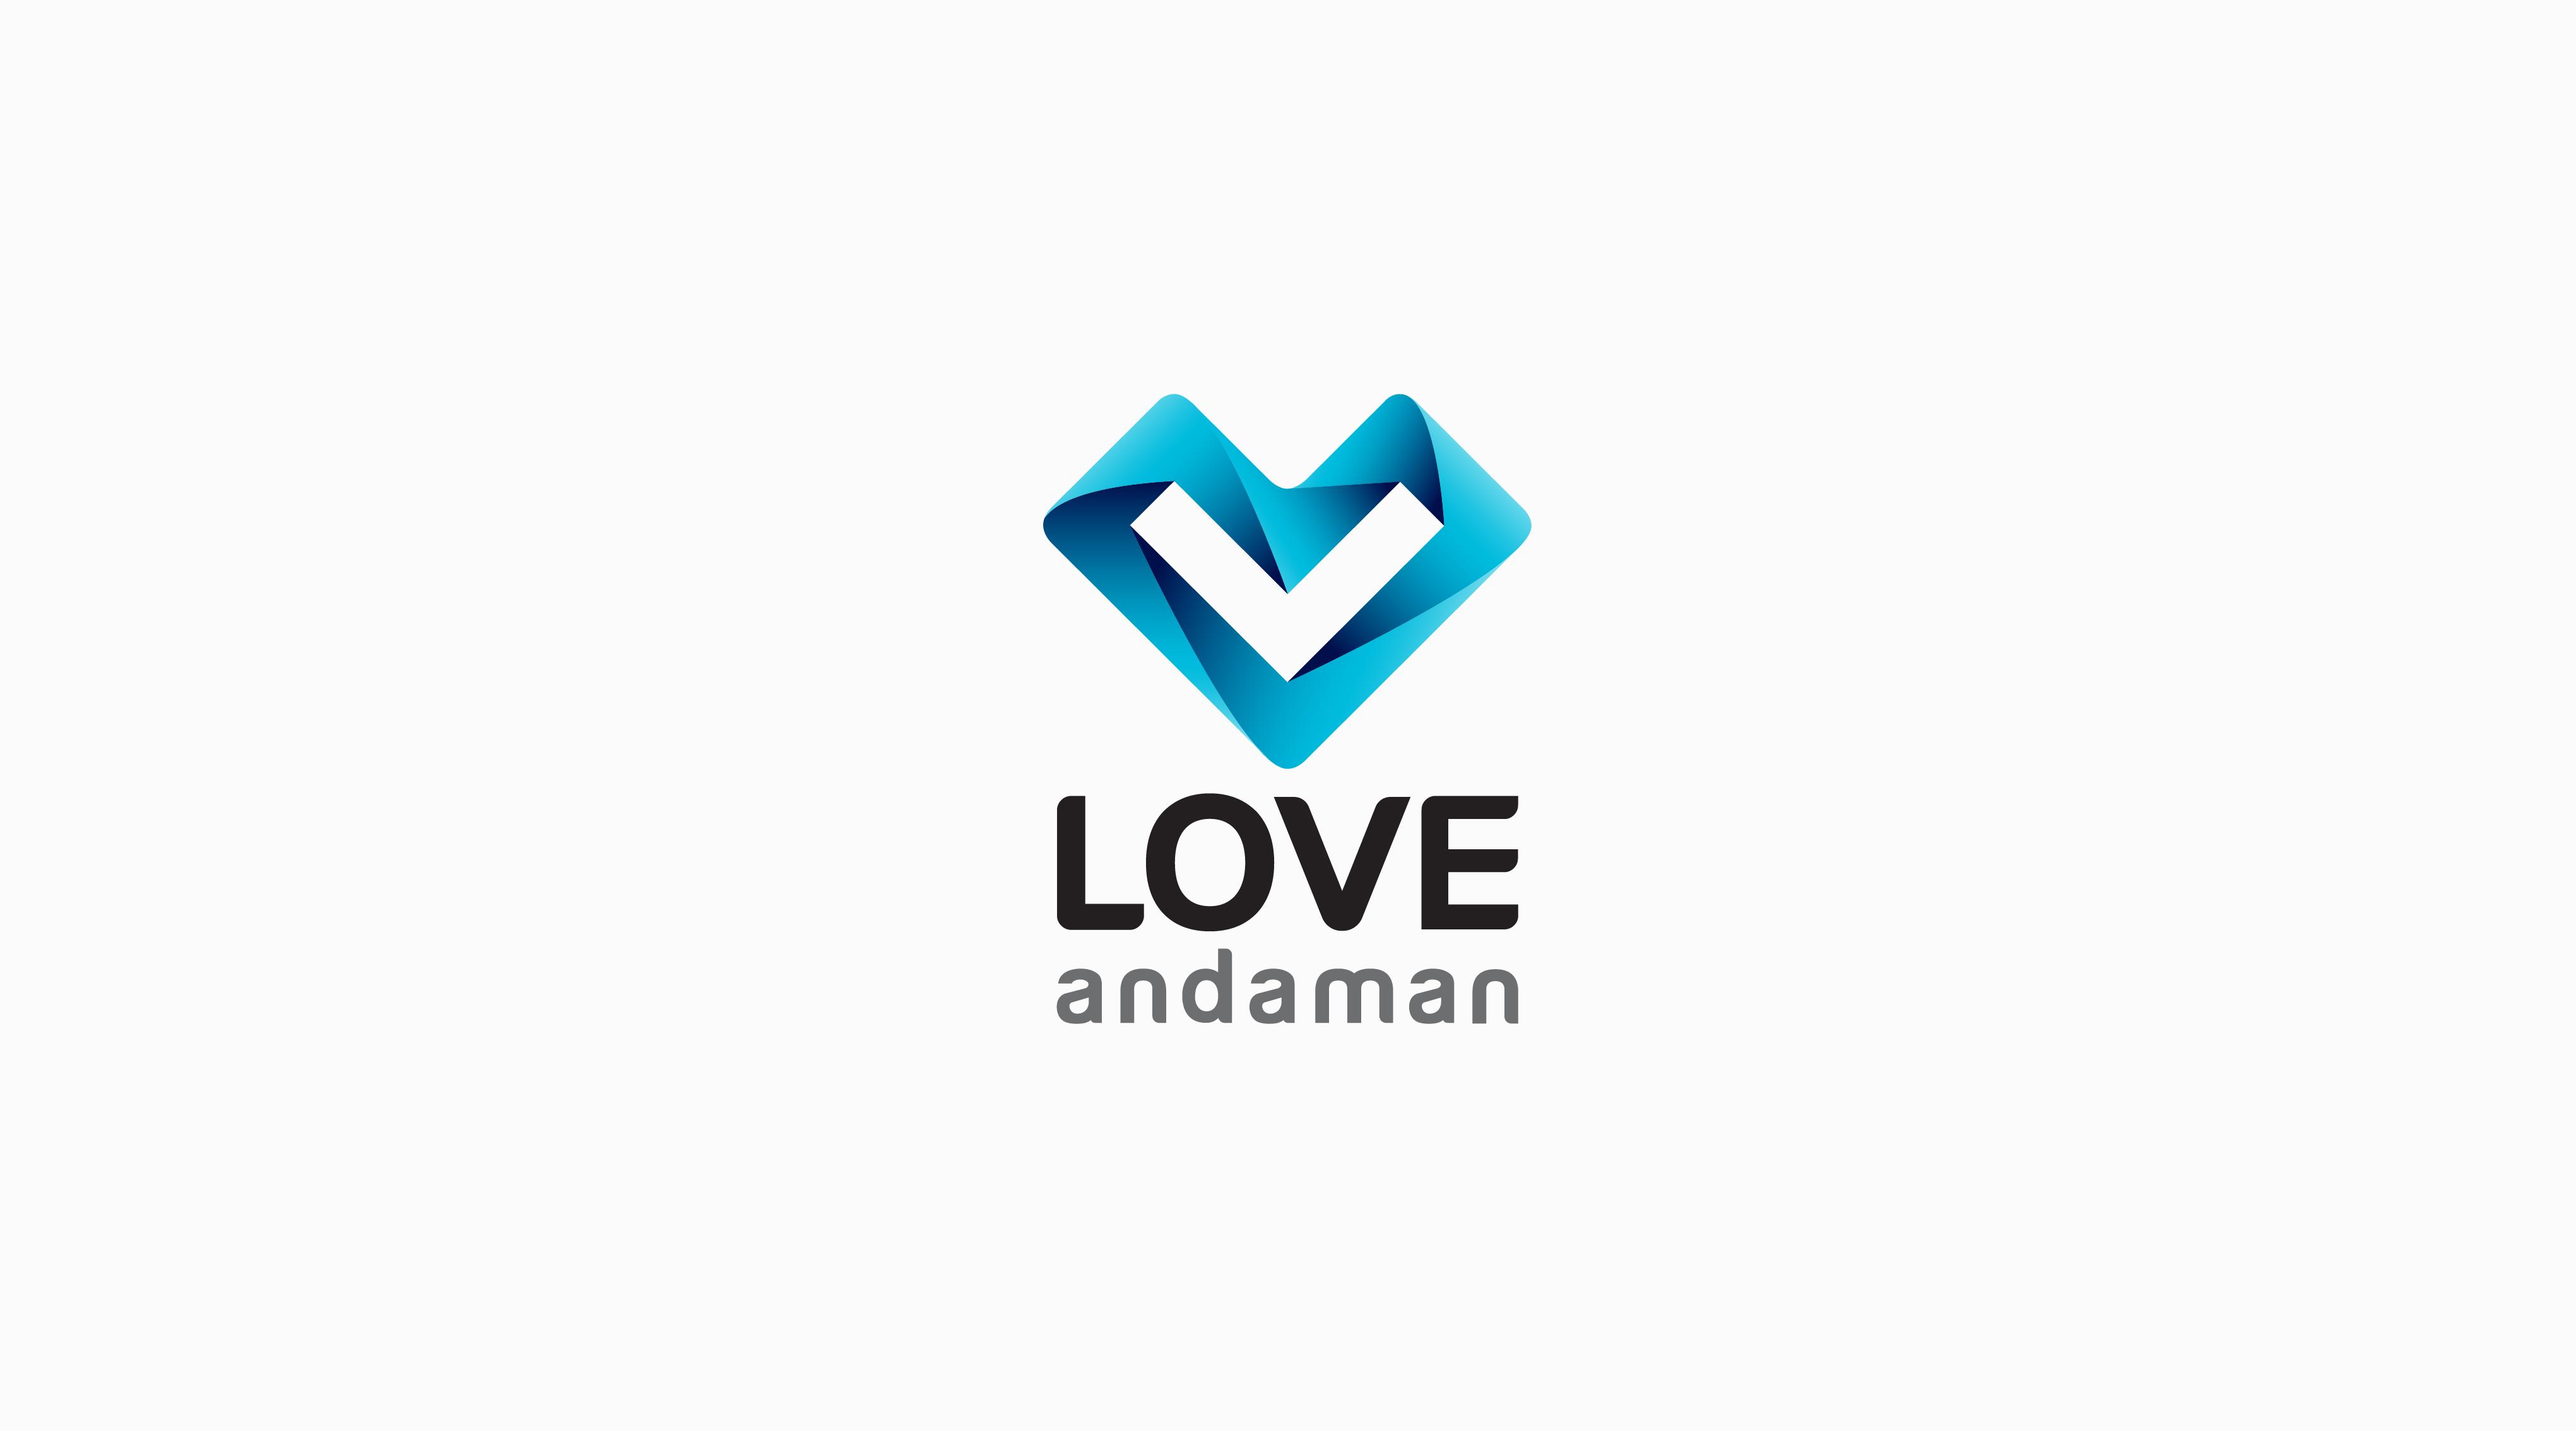 Loveandaman | Simplisis Branding Design Agency Phuket | Corporate Identity Design